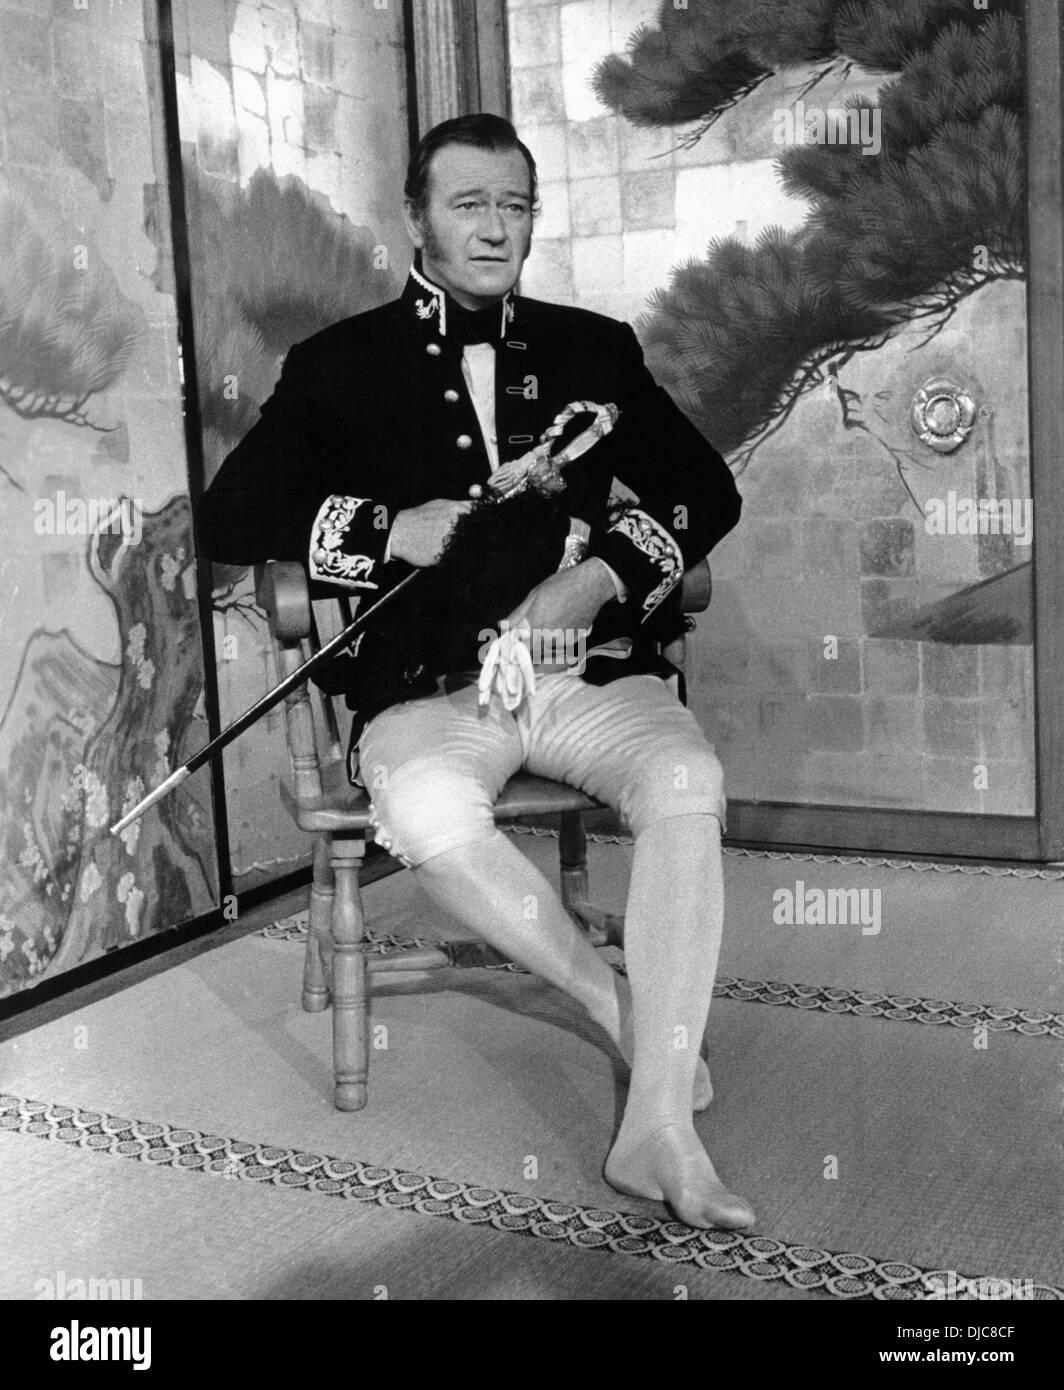 John Wayne on-set of the Film, The Barbarian and the Geisha, 1958, TM & Copyright (c) 20th Century Fox Film Corp. - Stock Image